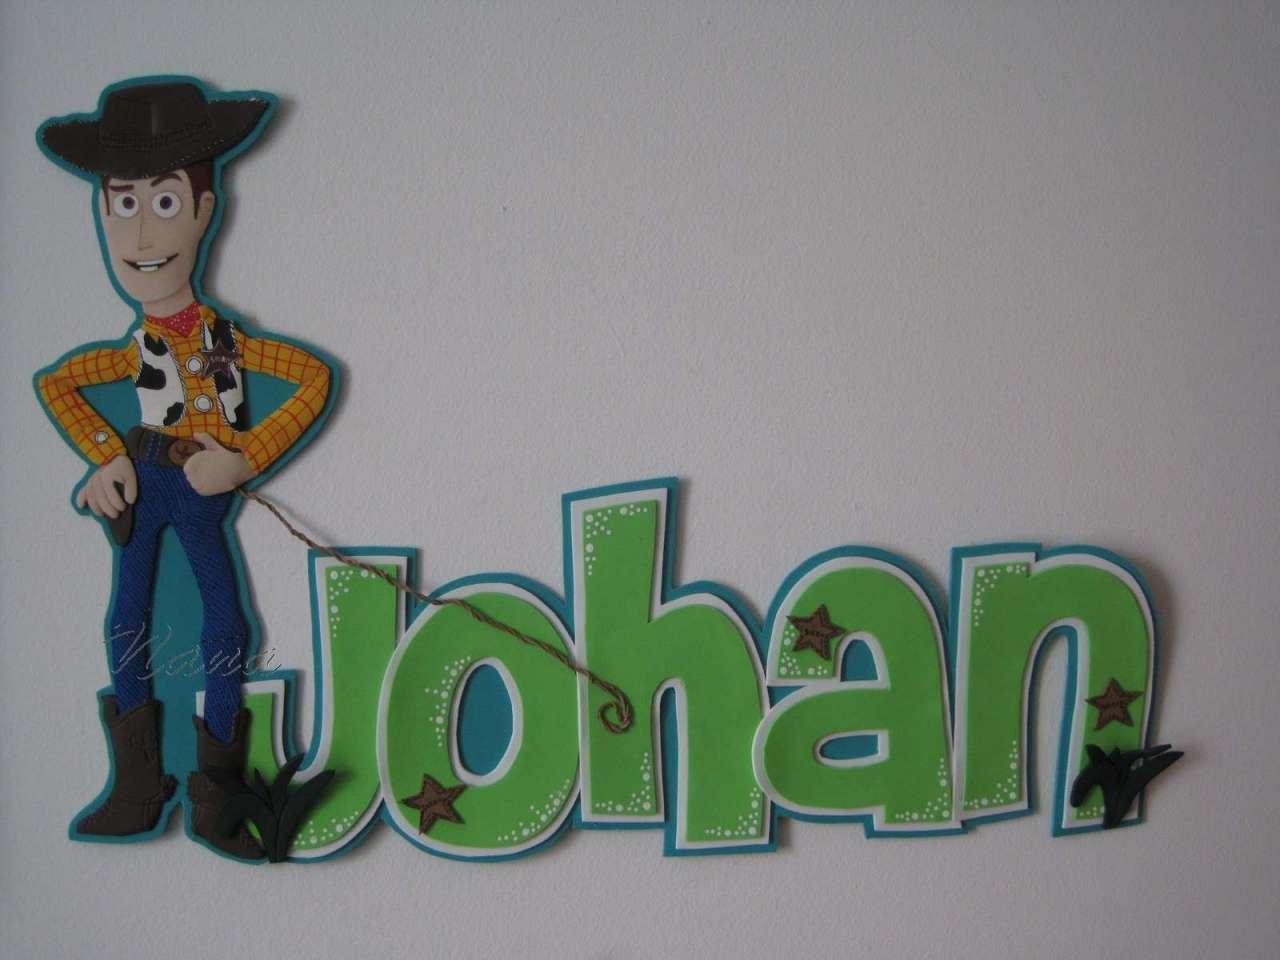 Johan Woody